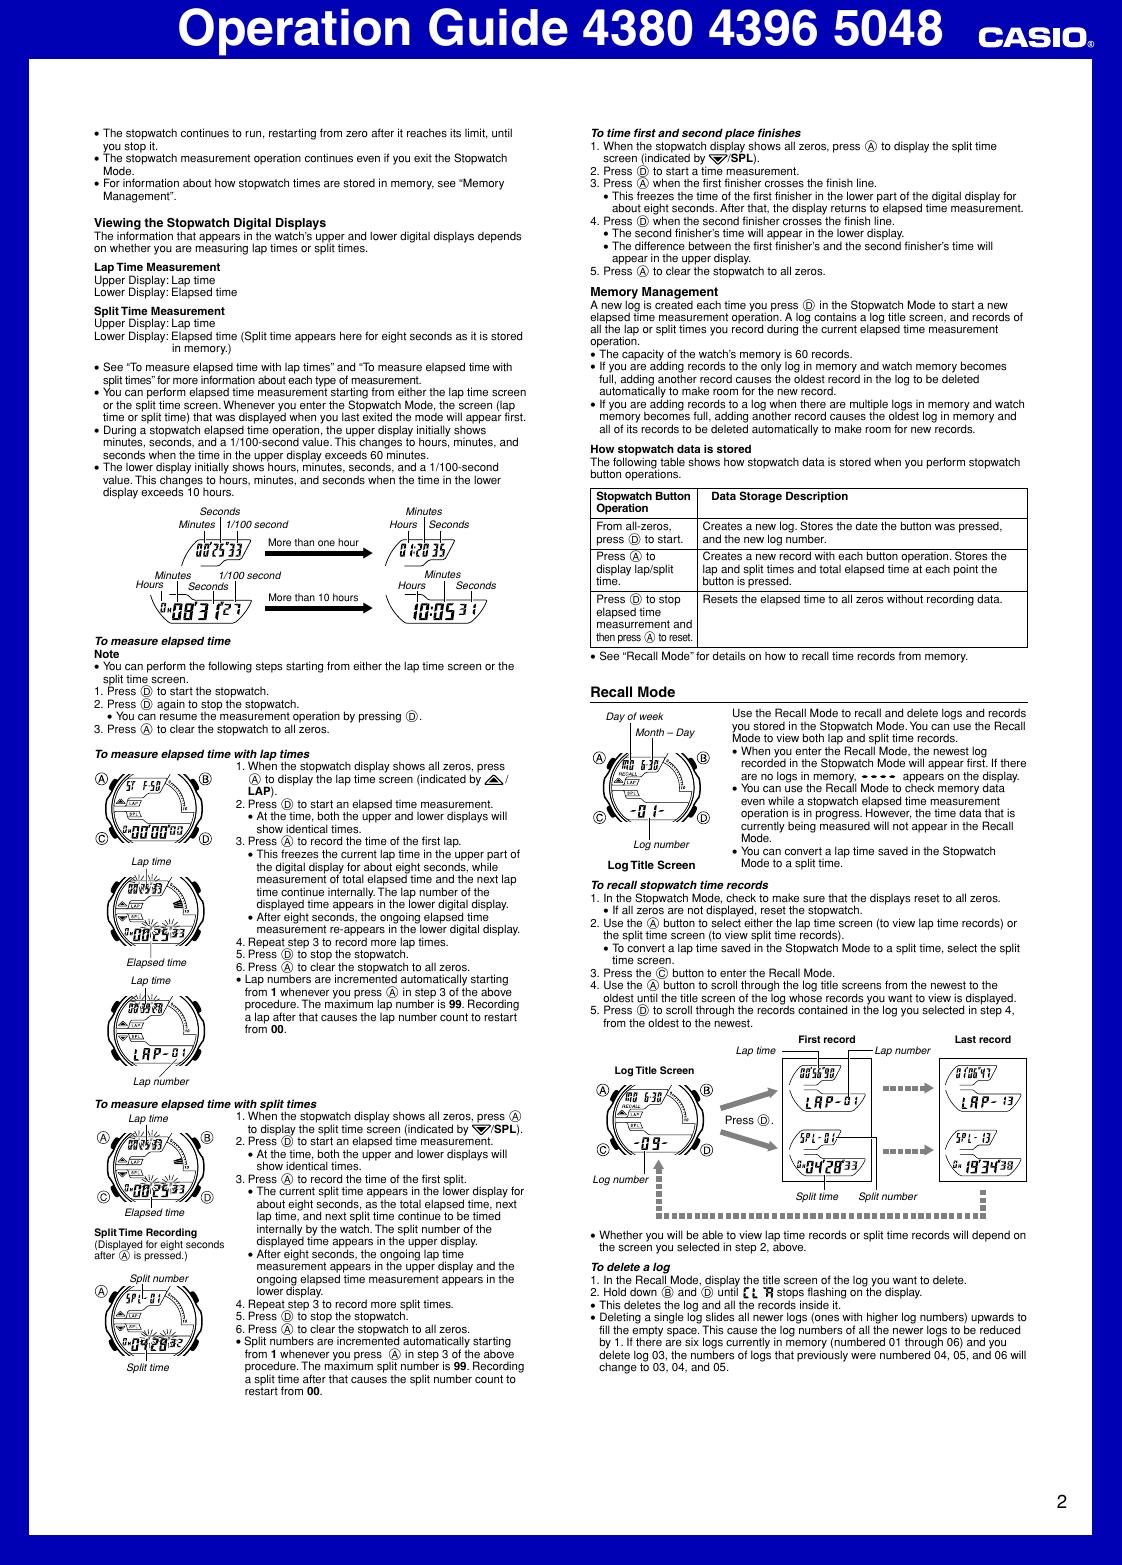 casio aq164w 1av operation manual qw 4380 4396 5048 rh usermanual wiki 4396 Indian Trail Memphis TN casio 4396 user manual